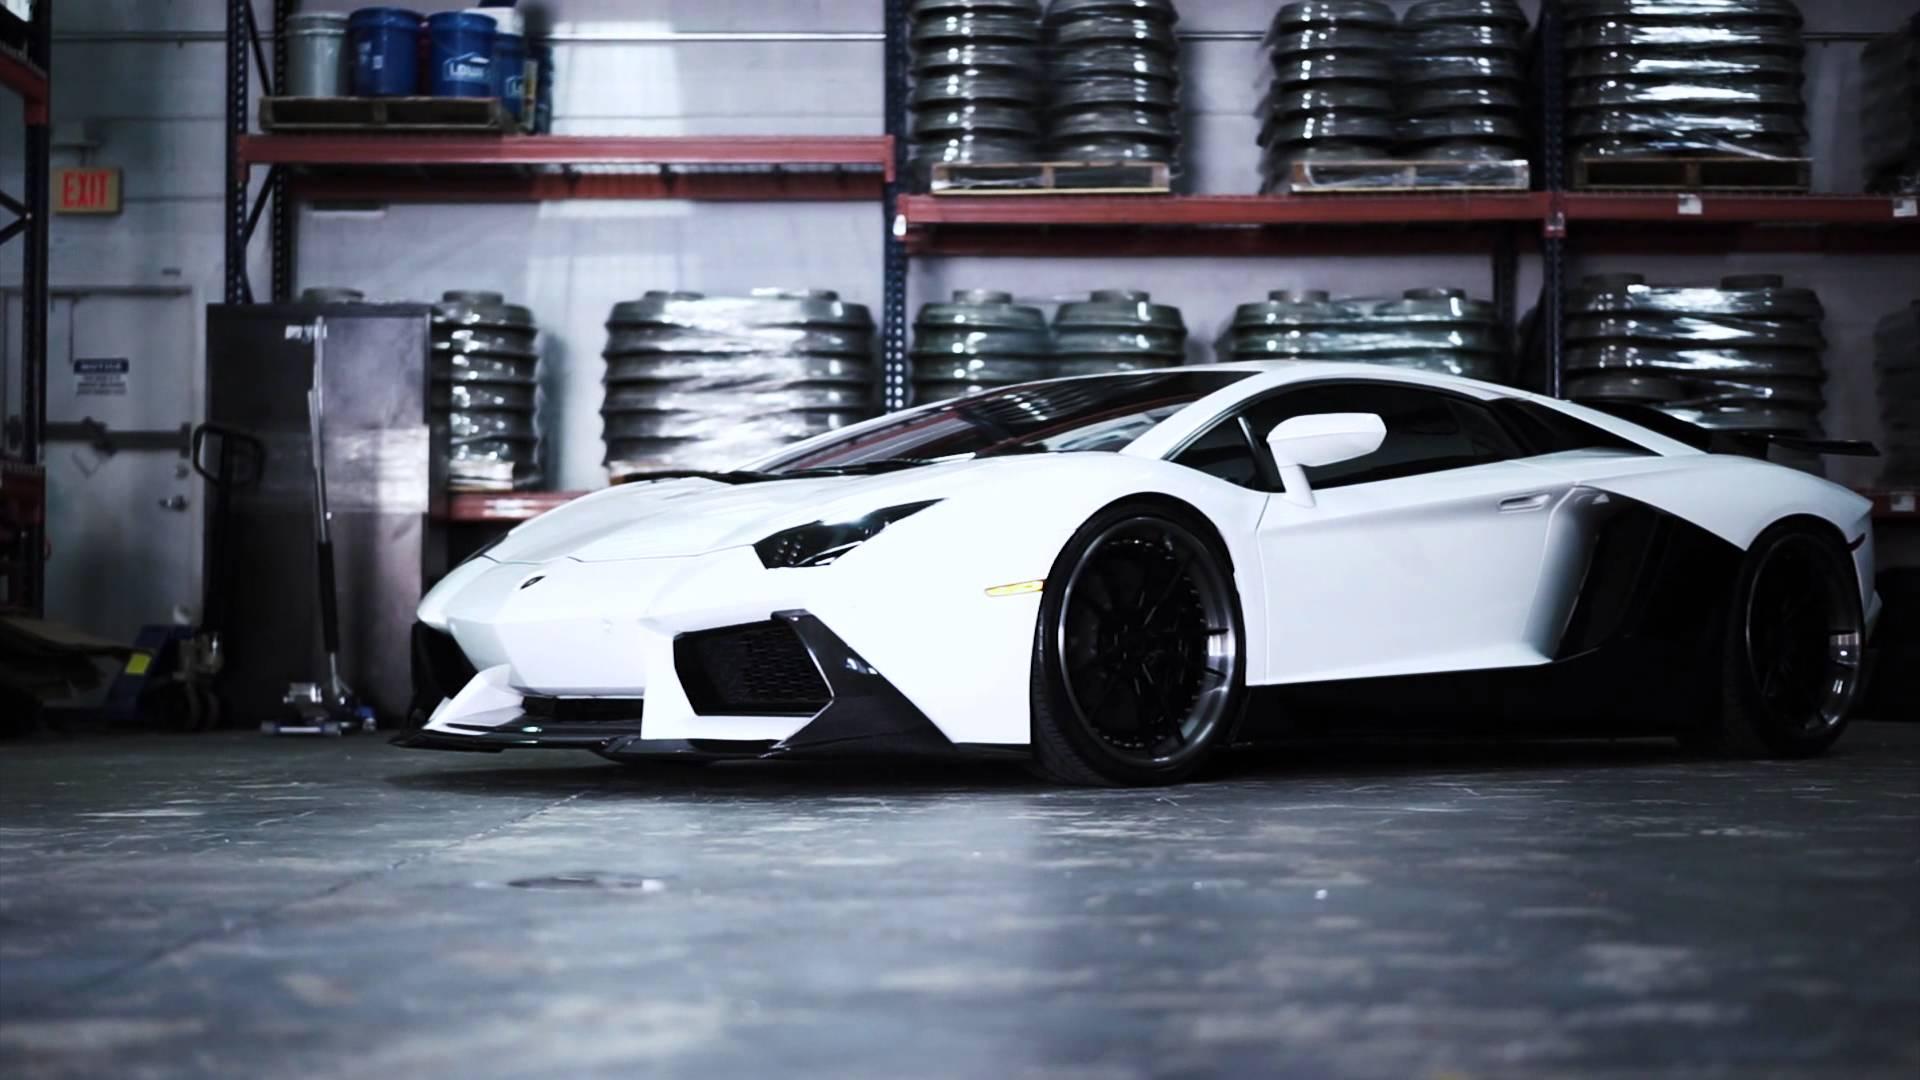 Face Melting Lamborghini Aventador - 4